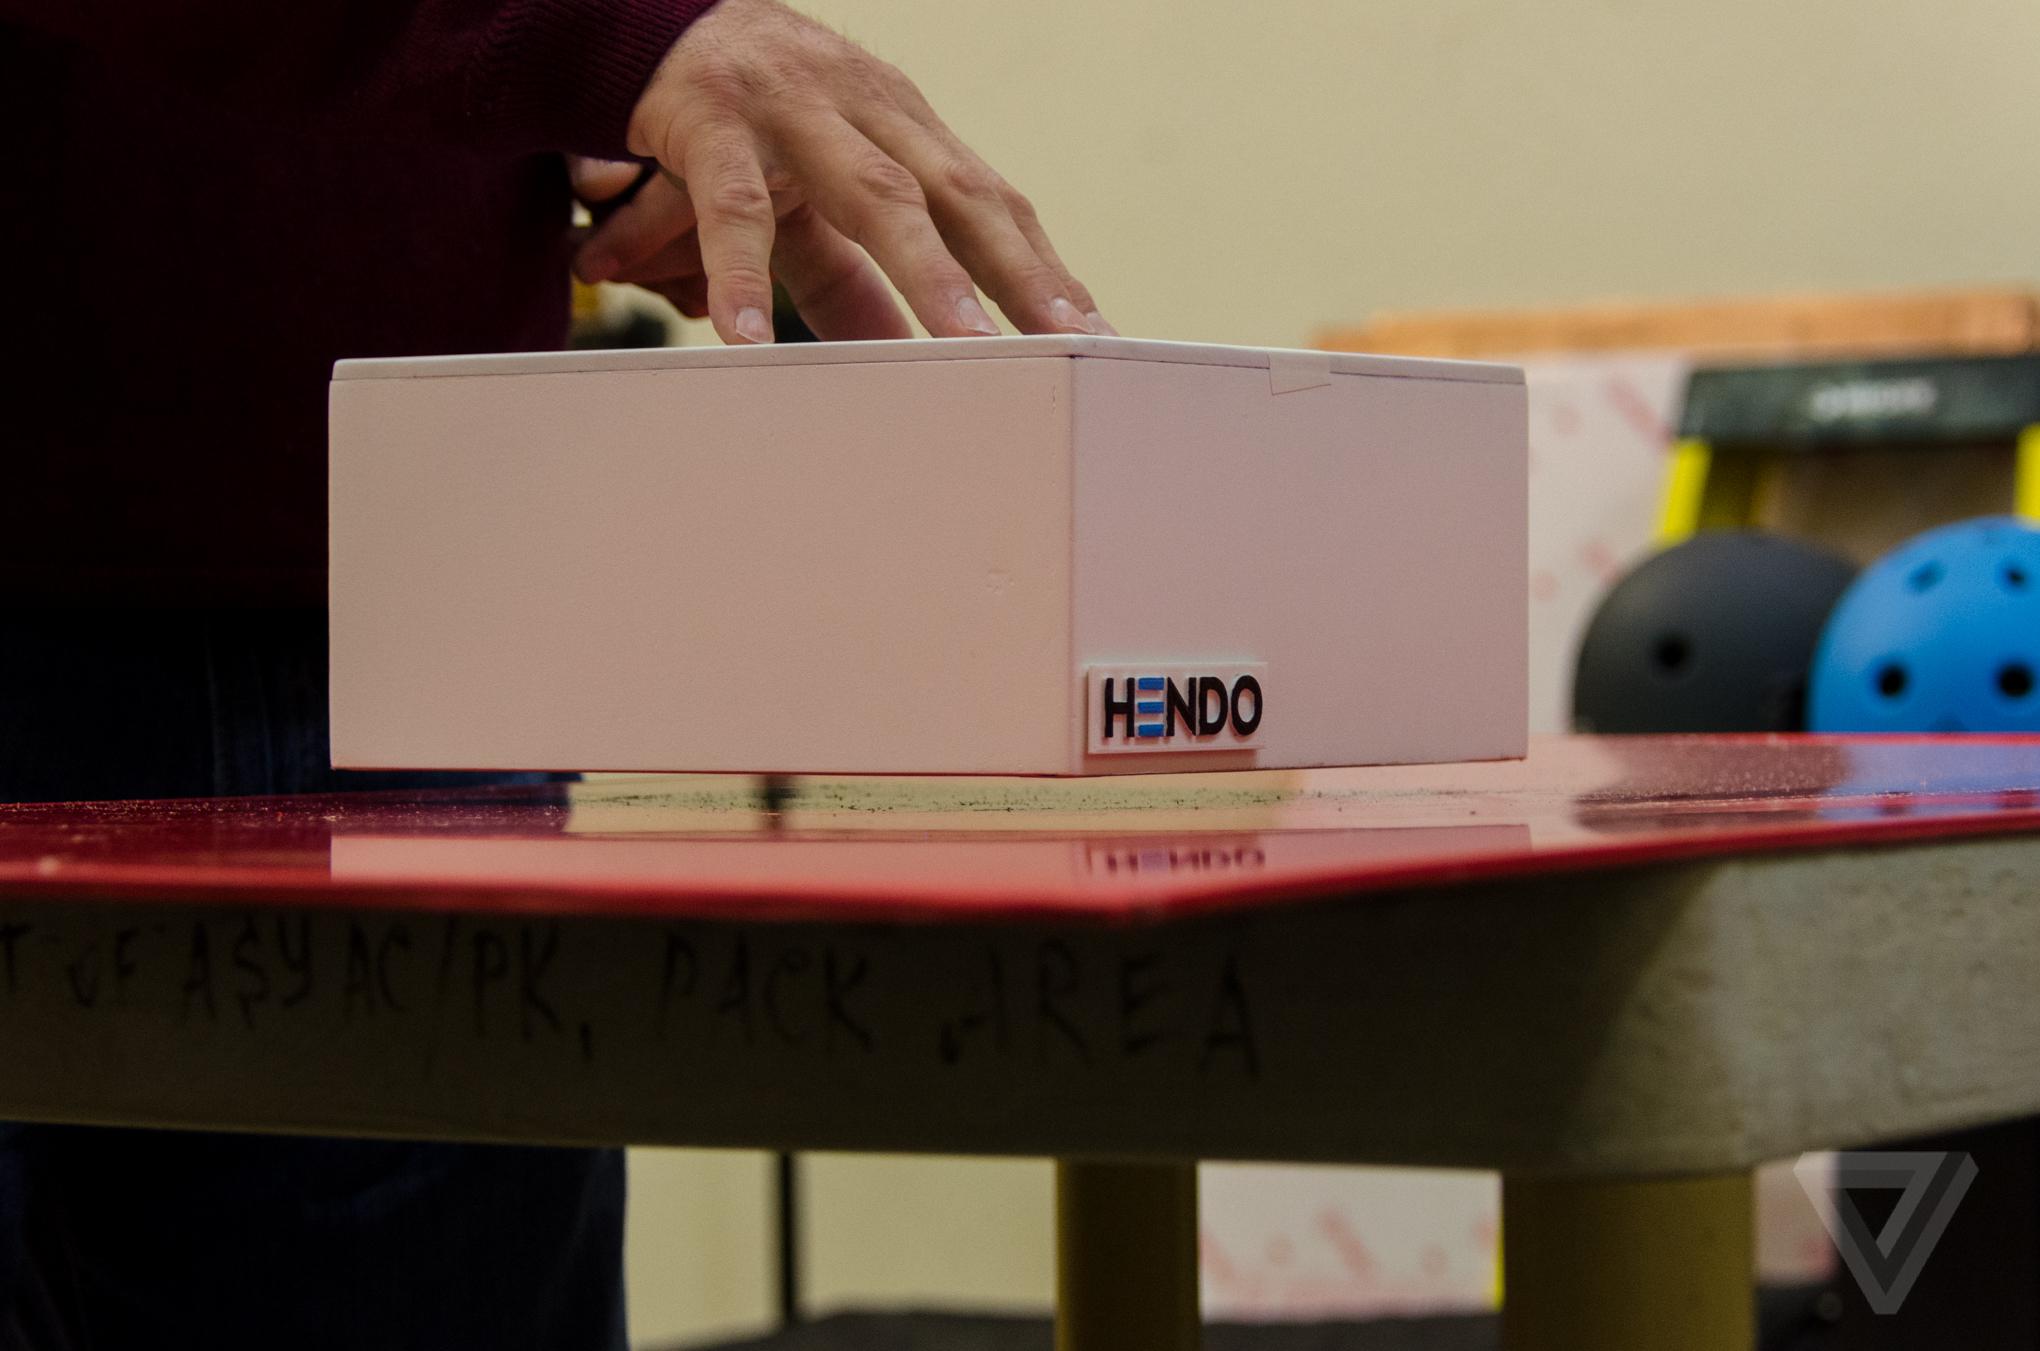 Hendo_Hoverboard_WhiteBox